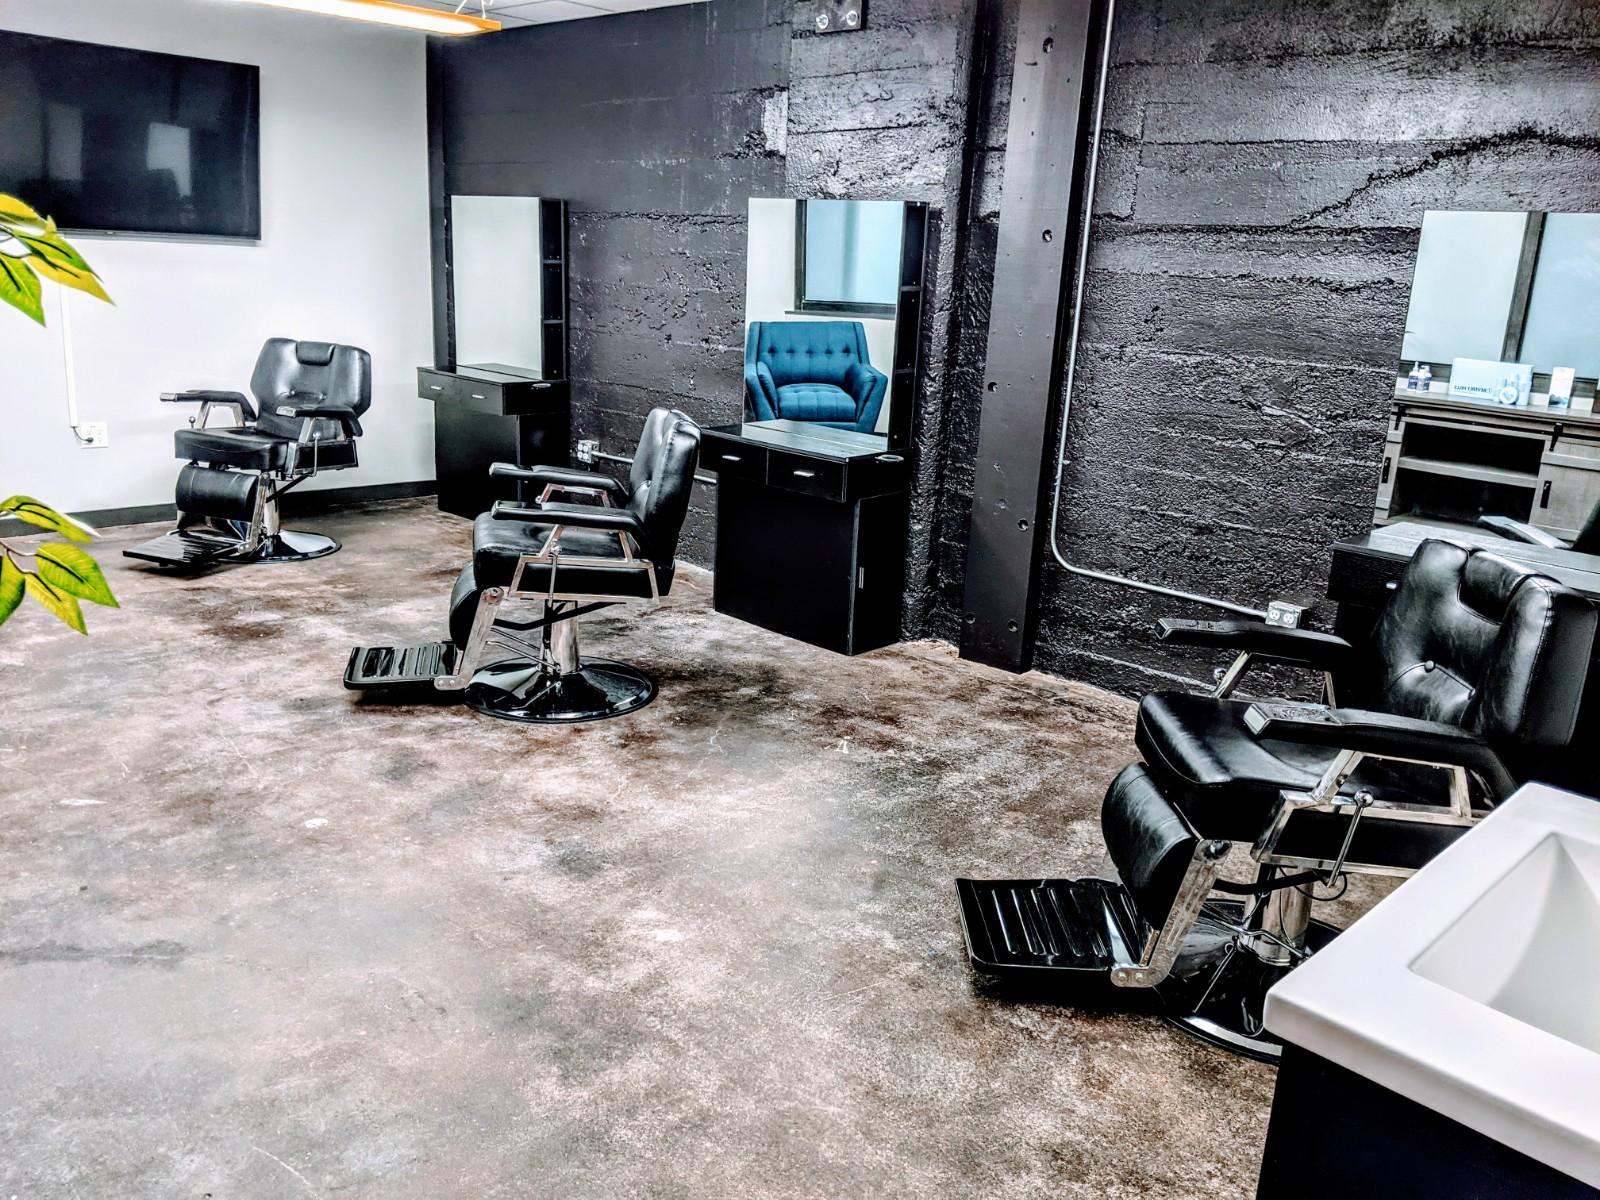 Barbershop, Super single salon suites, And salon booths available!